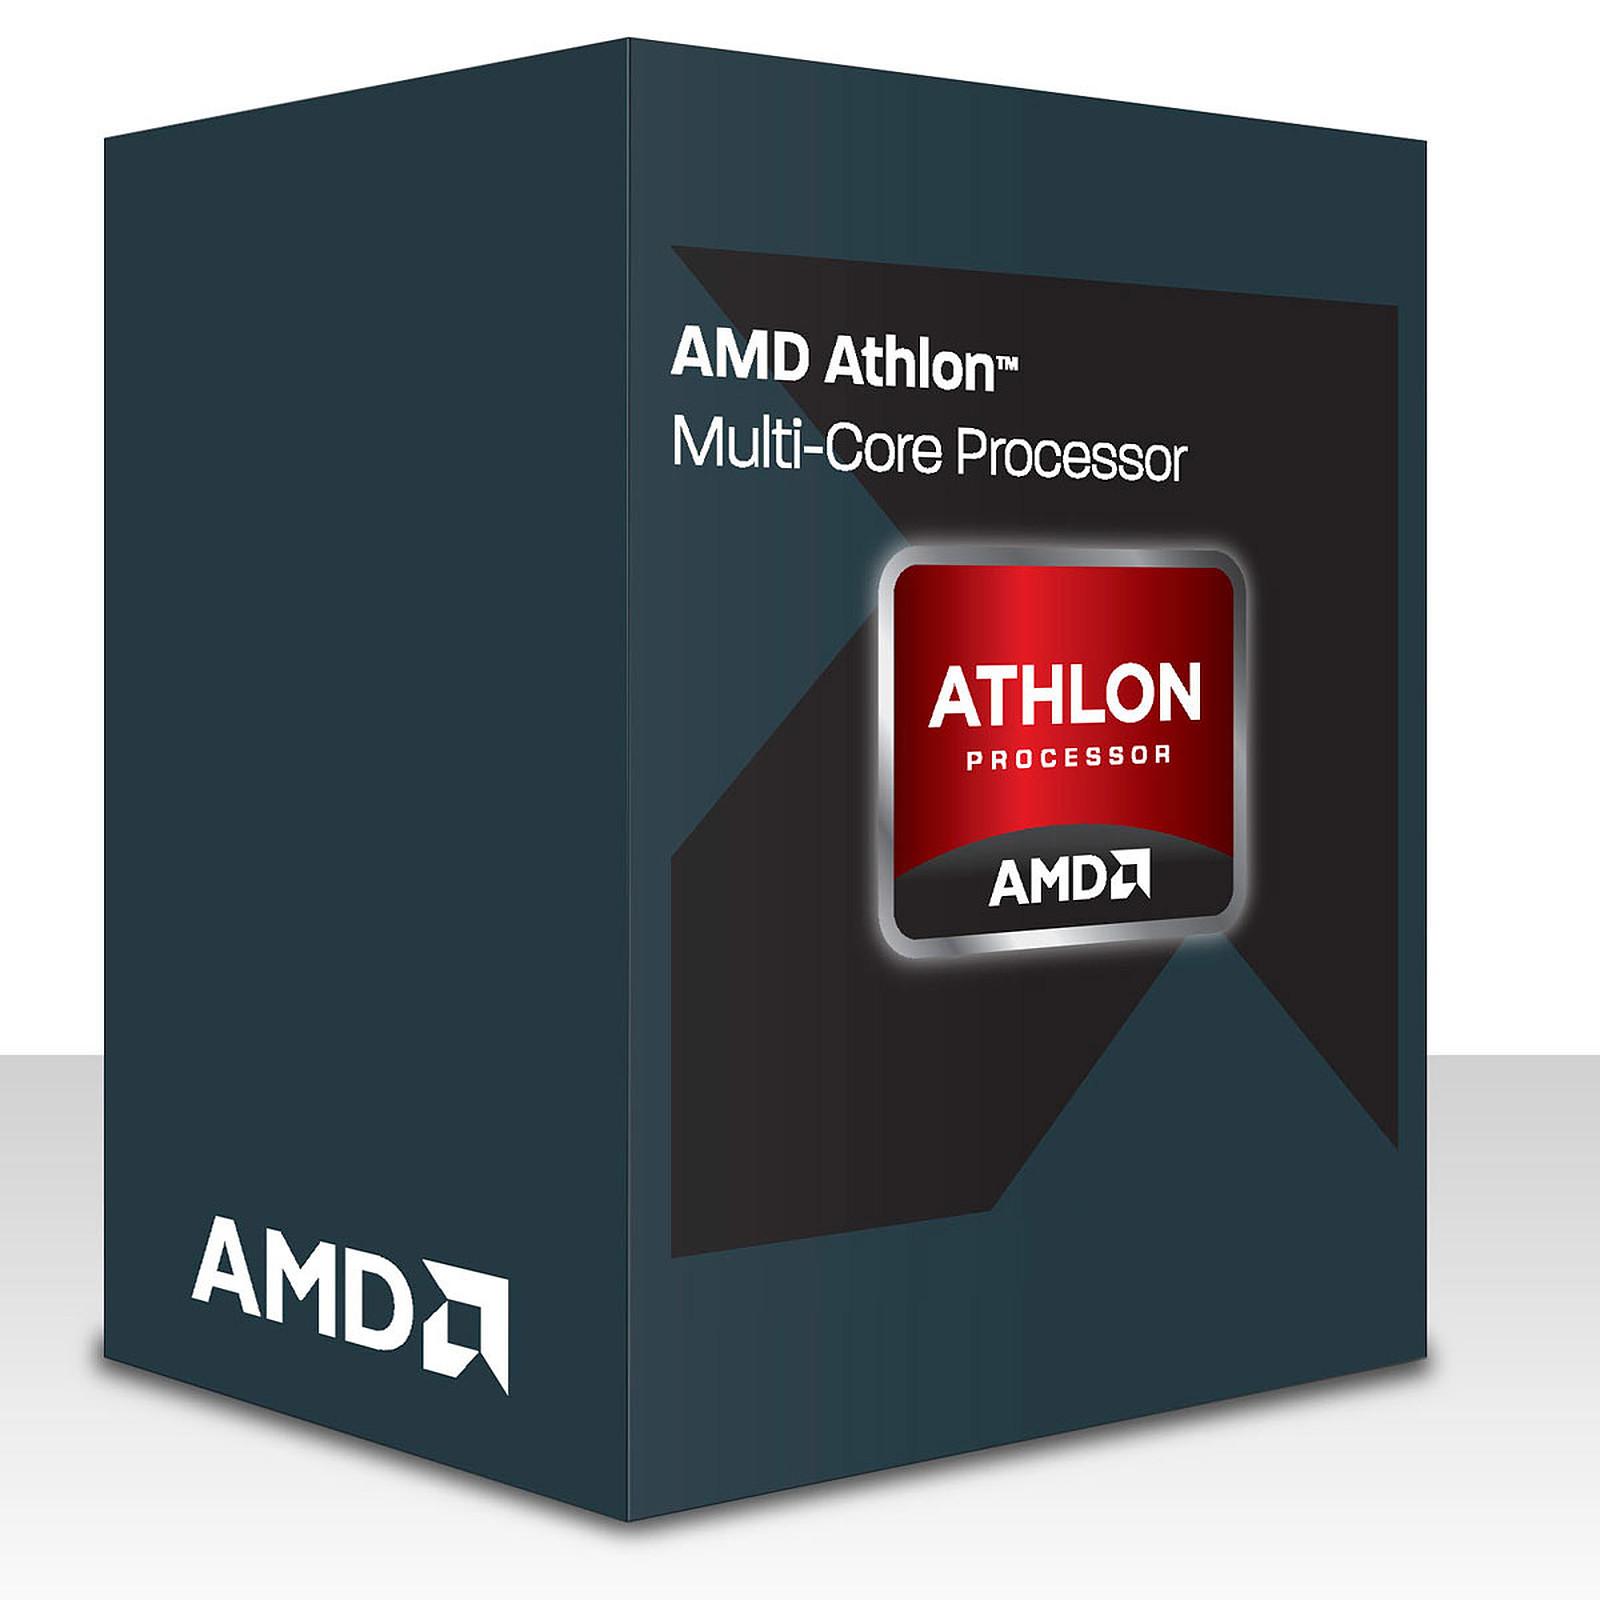 AMD Athlon X4 870K (3.9 GHz) - Low Noise Edition